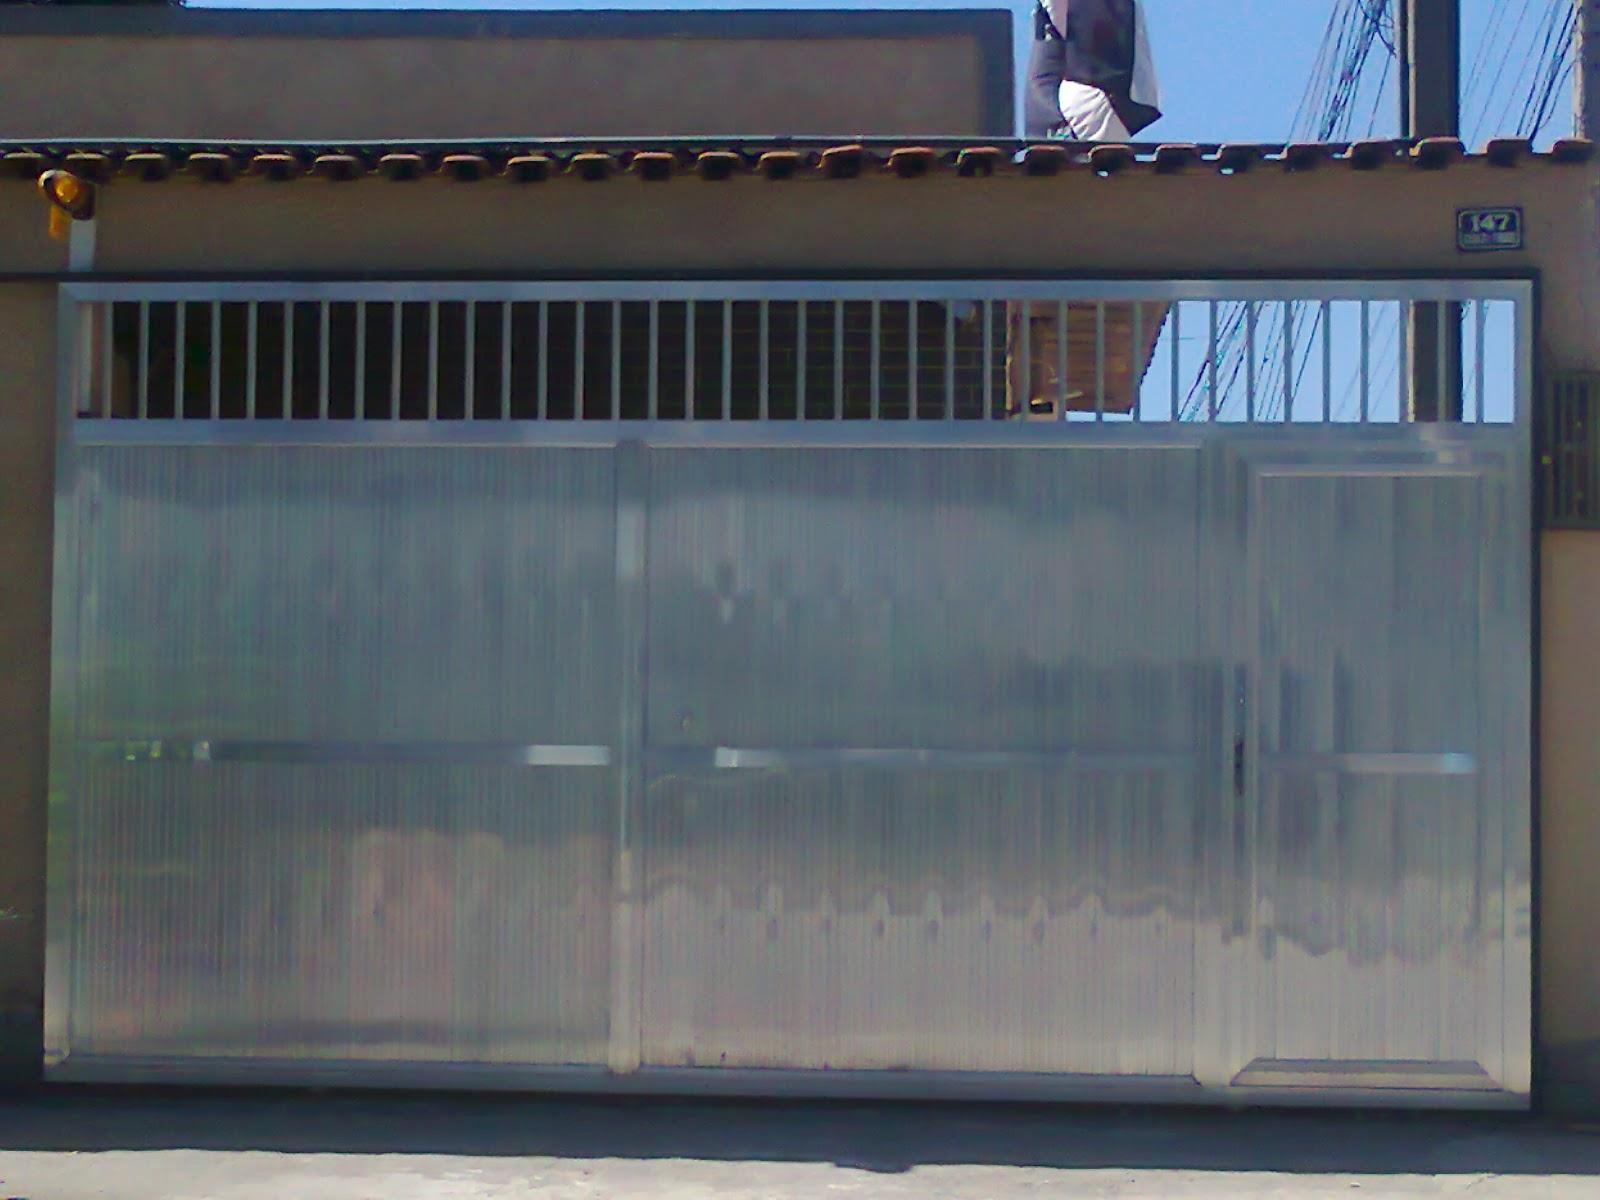 #2764A4 SERRALHERIA DEL CASTILHO RJ ZONA NORTE: Serralheria Del Castilho  1002 Portas E Janelas De Aluminio Baratas No Rj